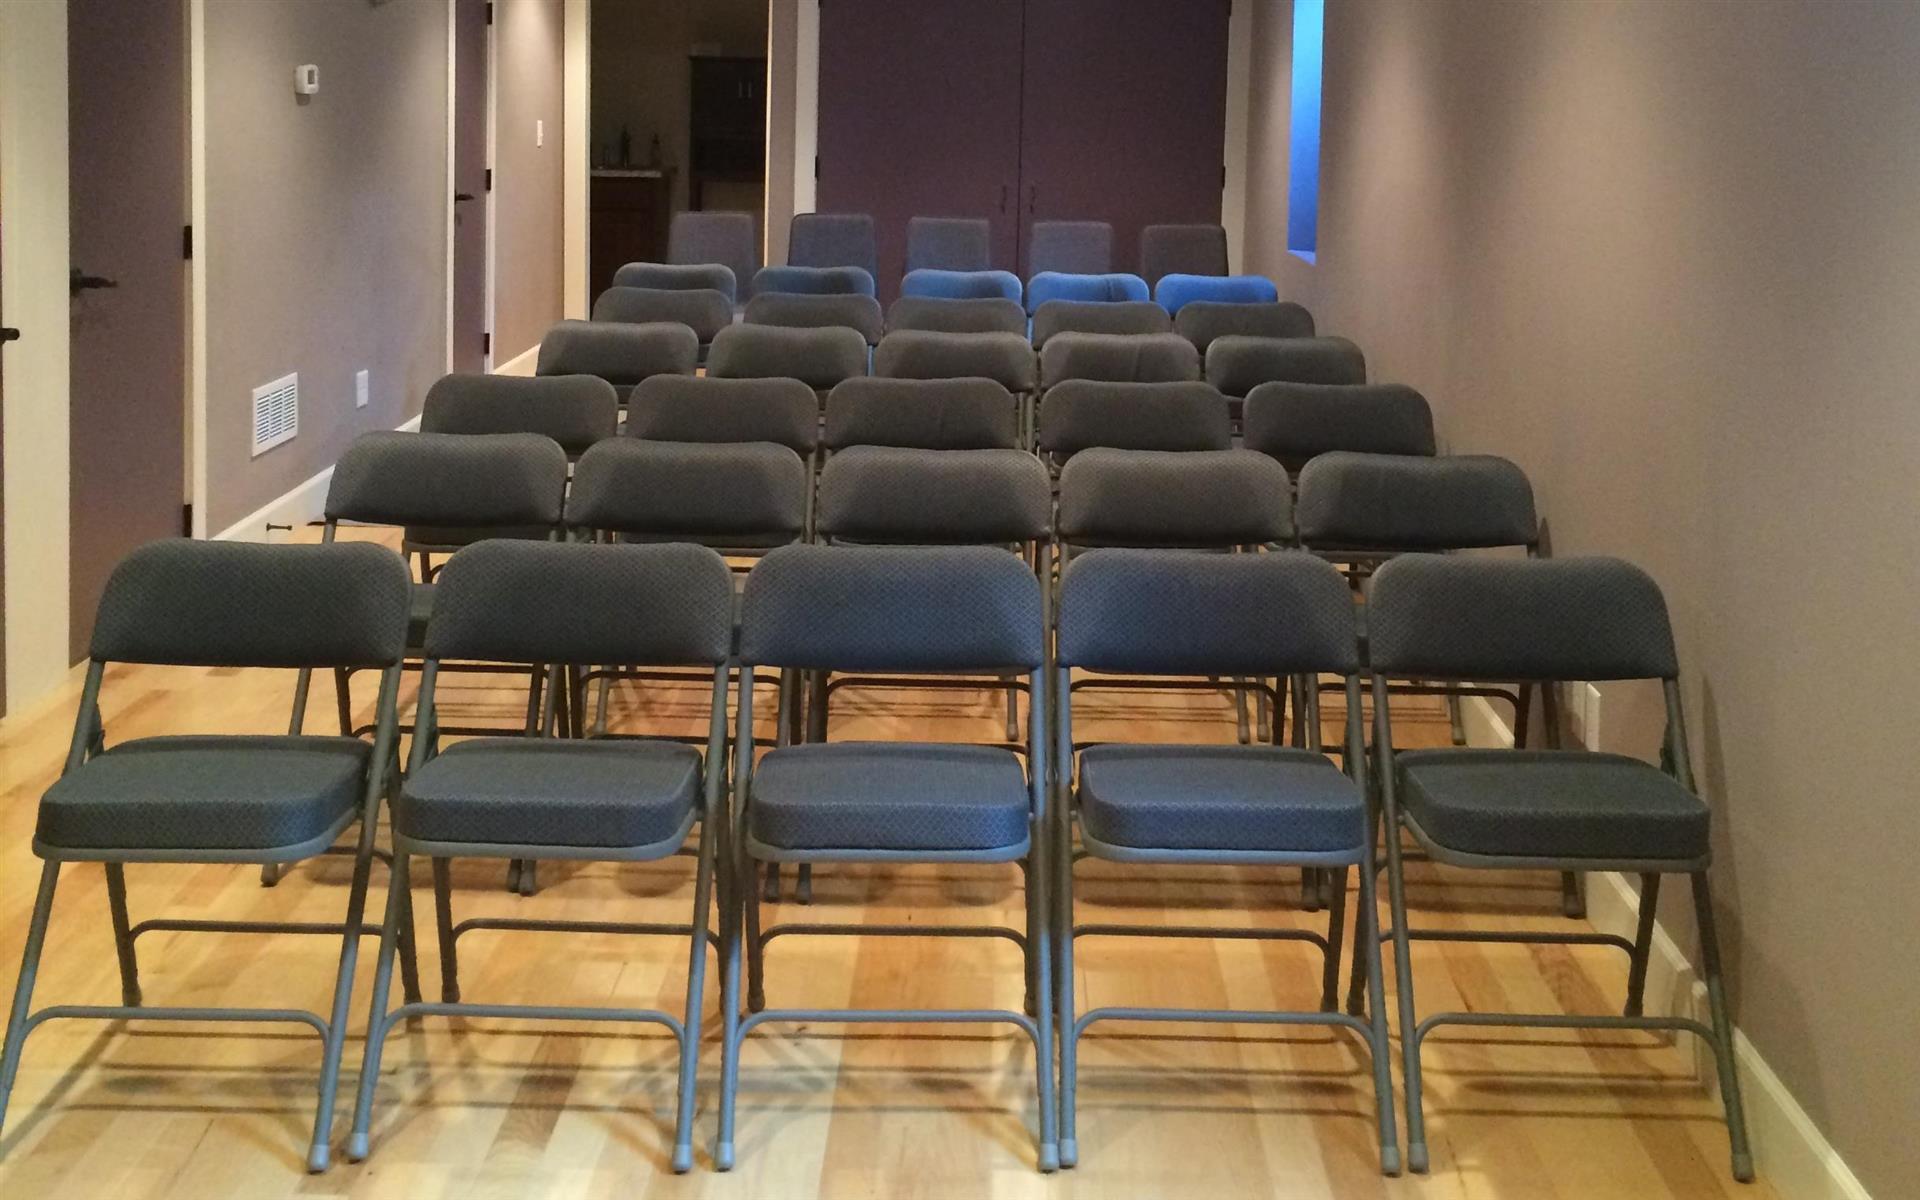 Phoenix Rising LLC - Executive Meeting/ Conference Room